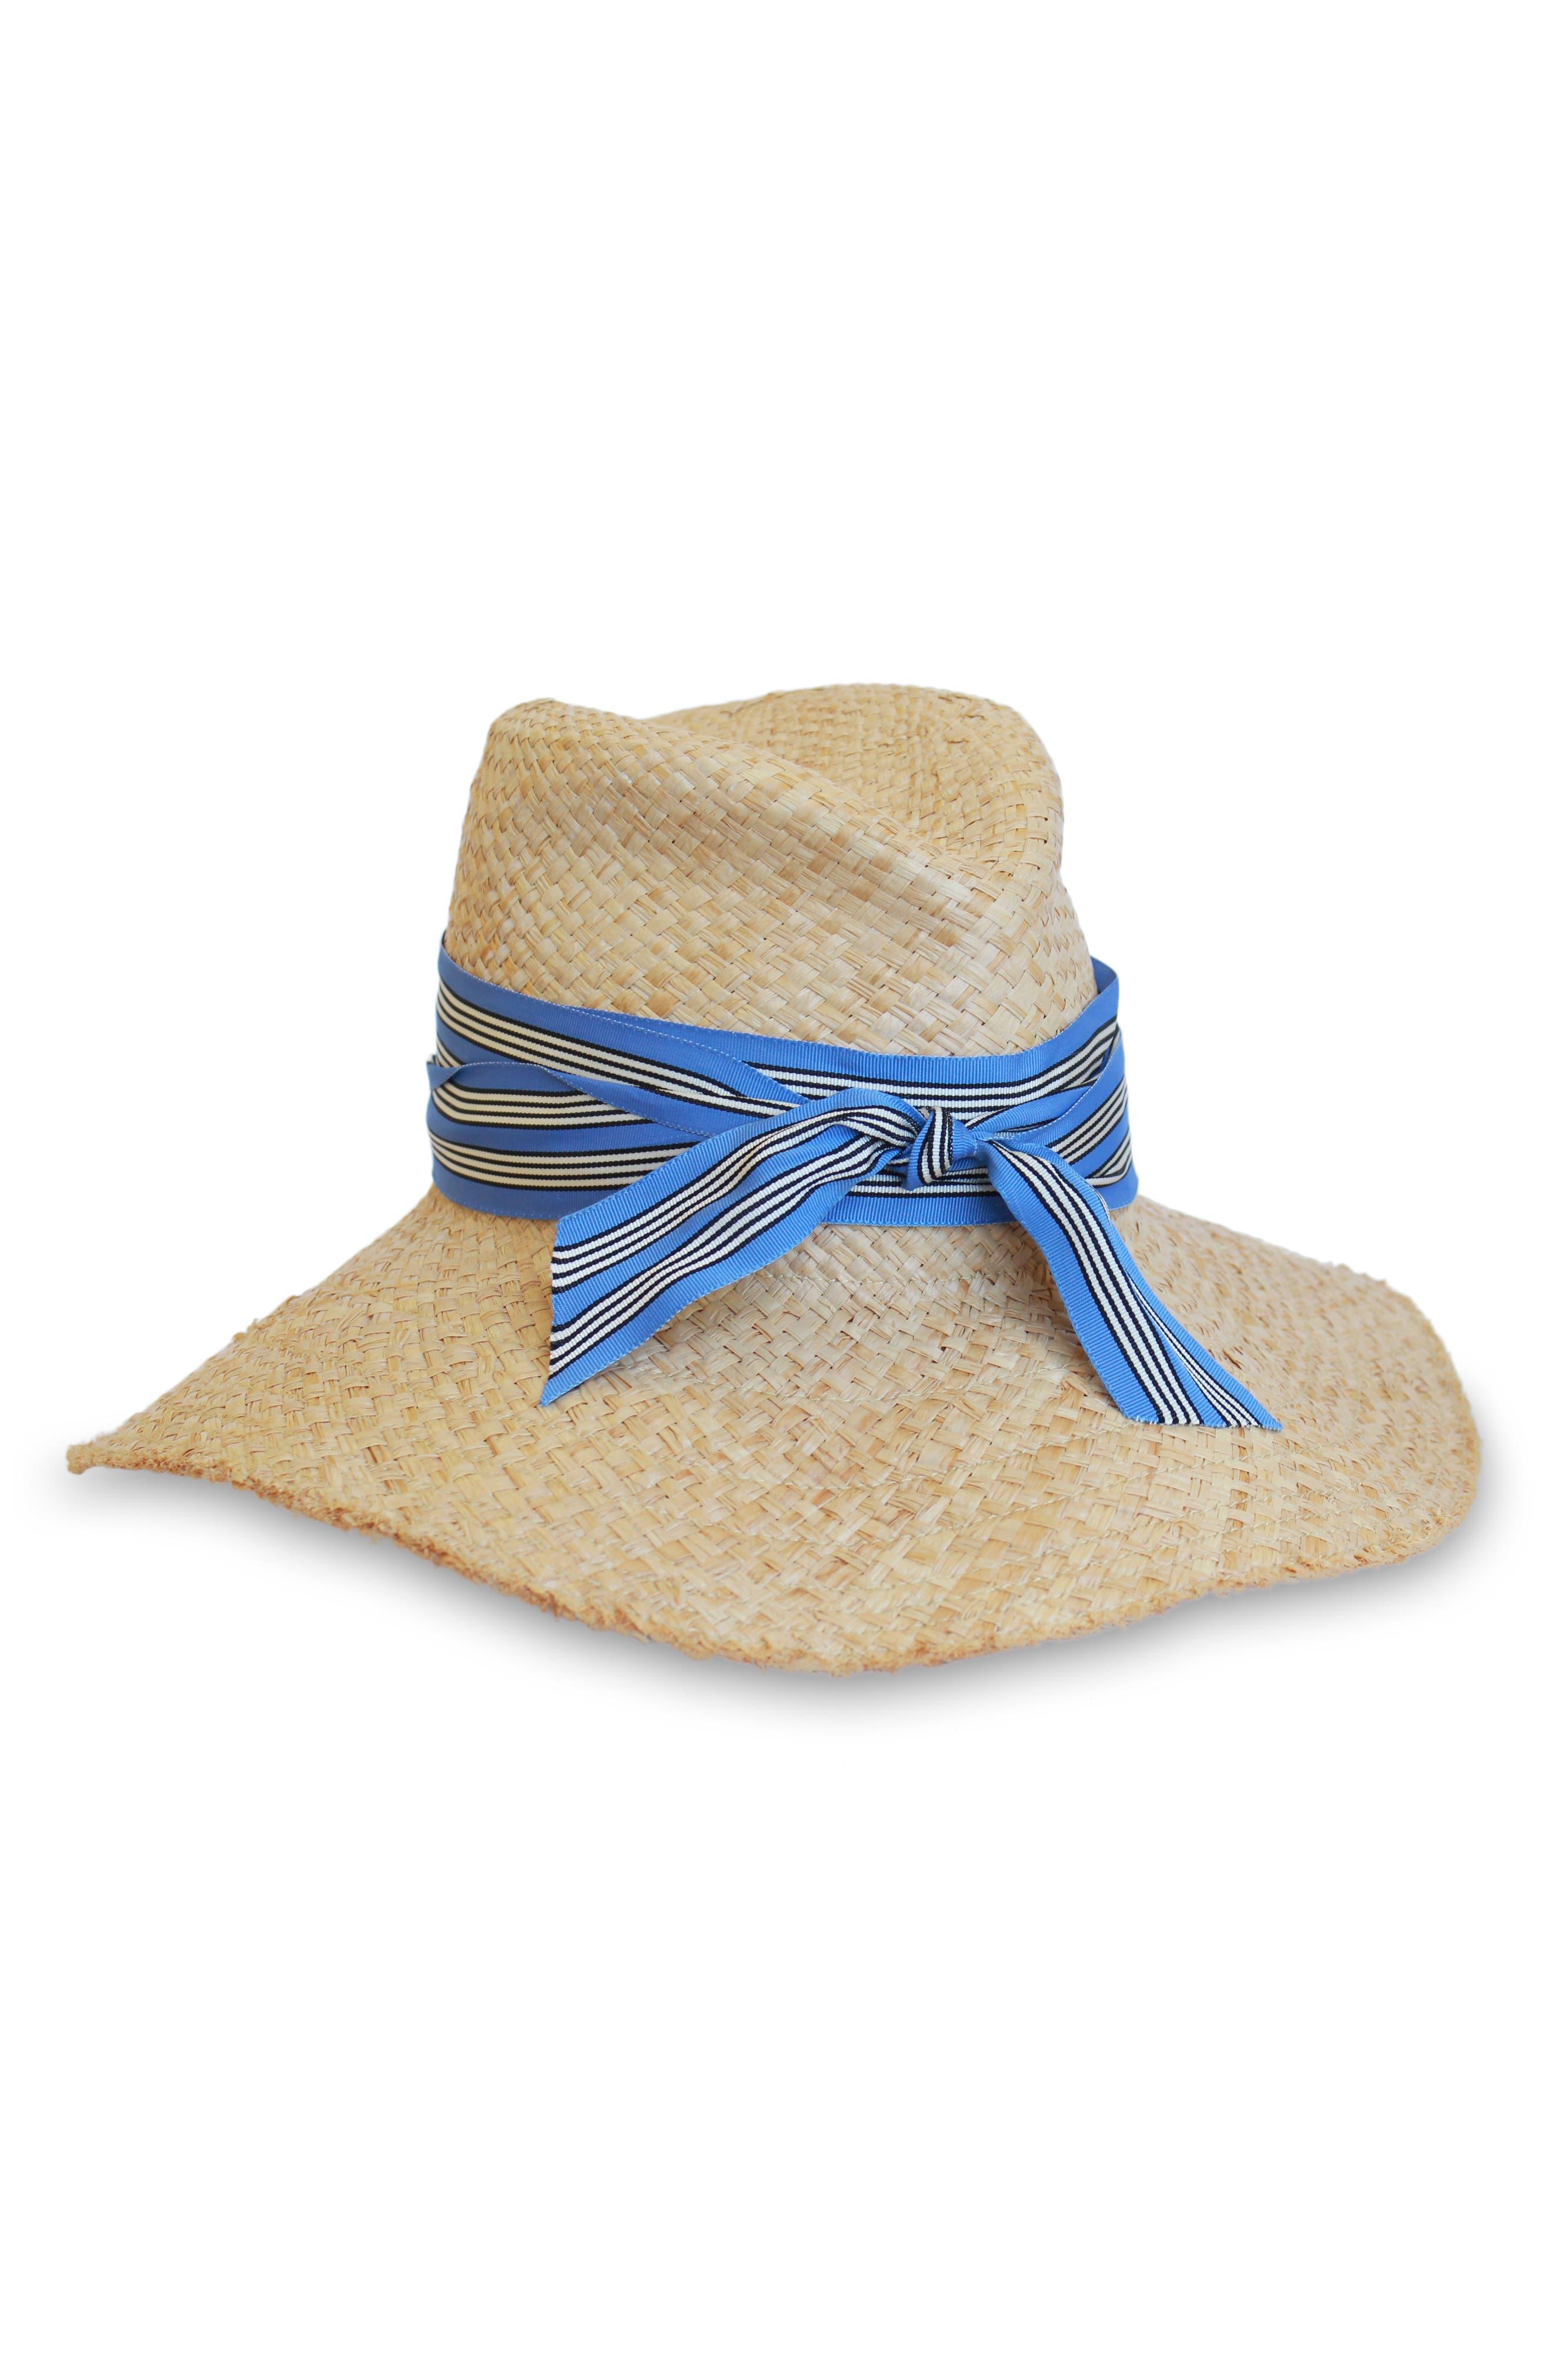 First Aid Striped Band Straw Hat,                             Main thumbnail 1, color,                             NATURAL/ REGATTA